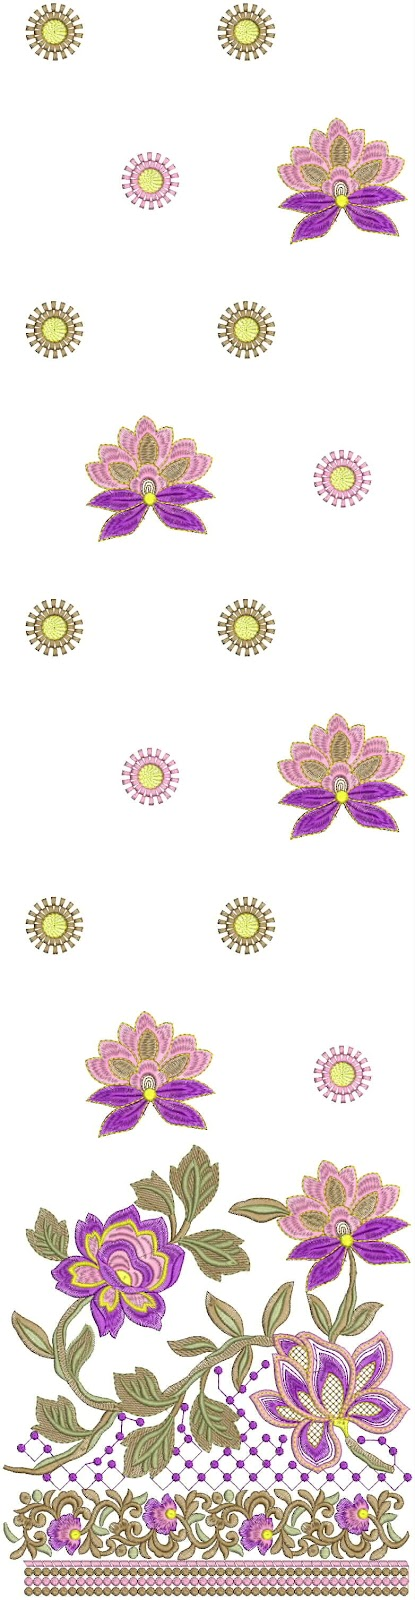 Embdesigntube daman tunic embroidery designs collection